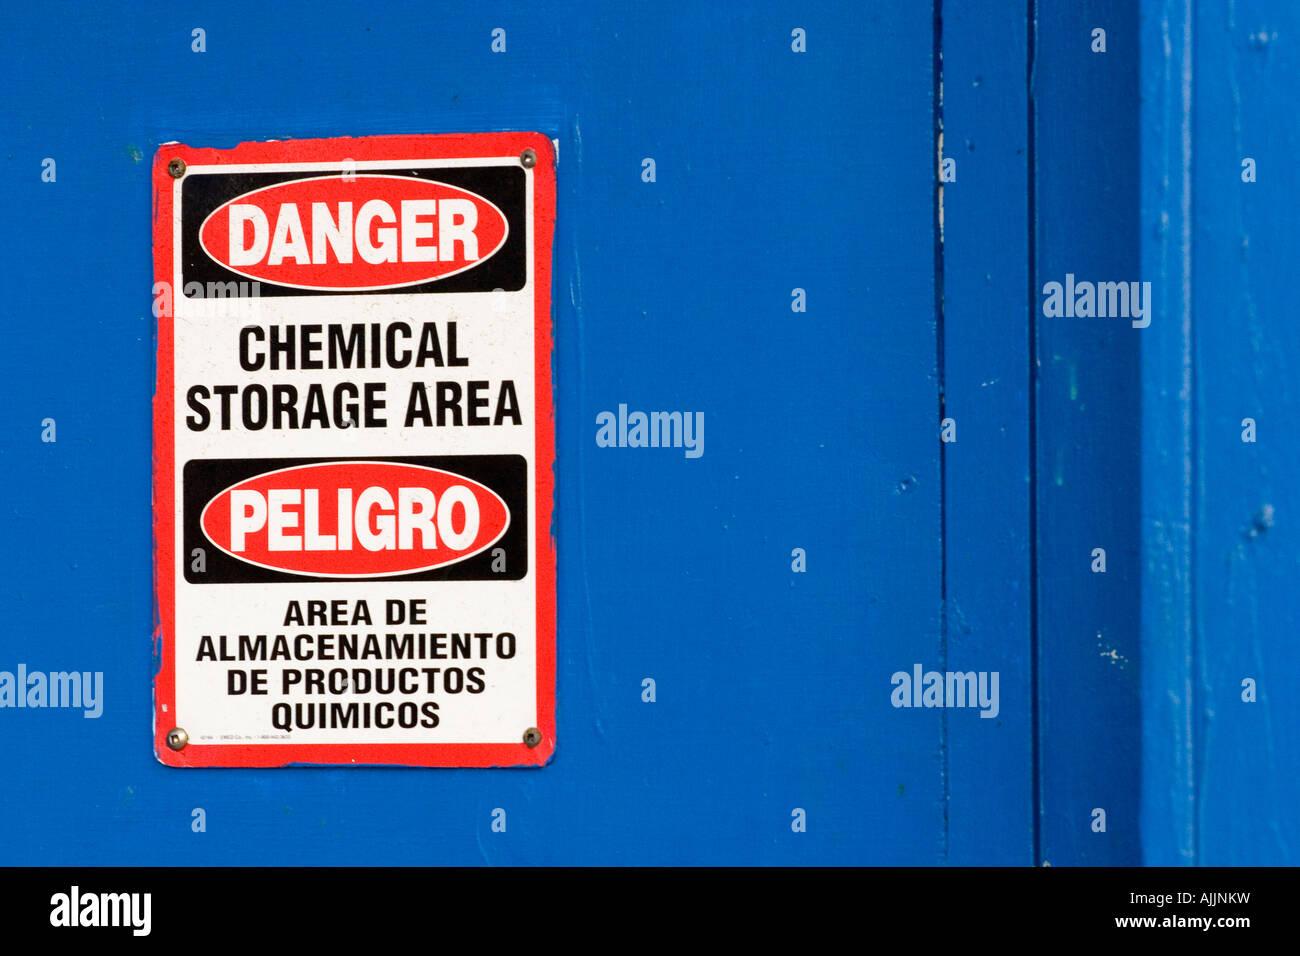 Sign warning danger chemical storage area - Stock Image